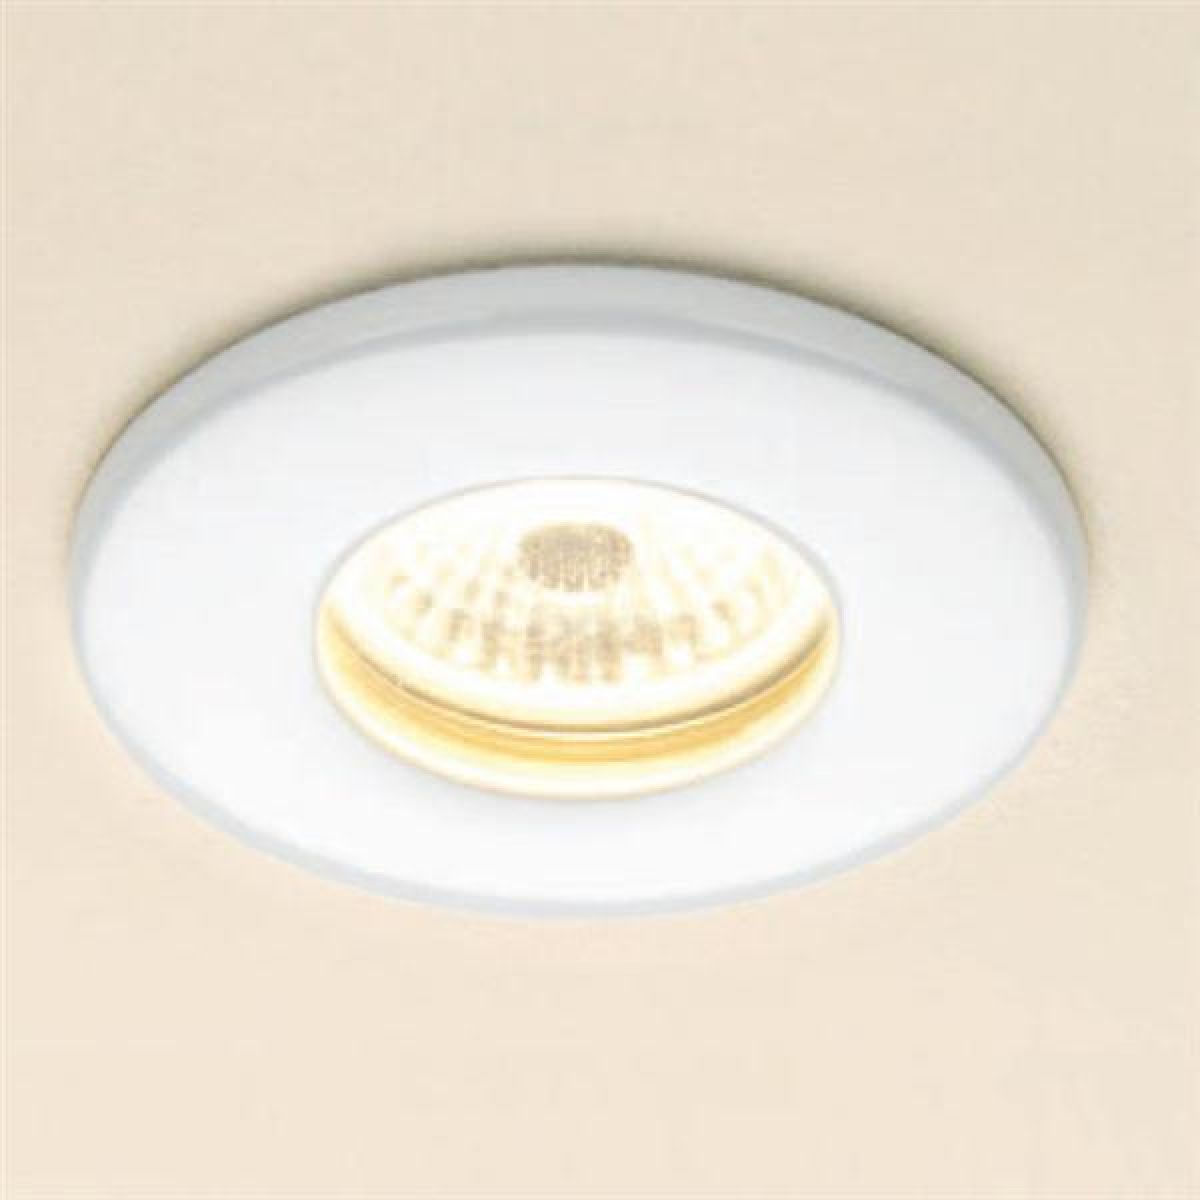 HiB Warm White LED Round White Shower Light